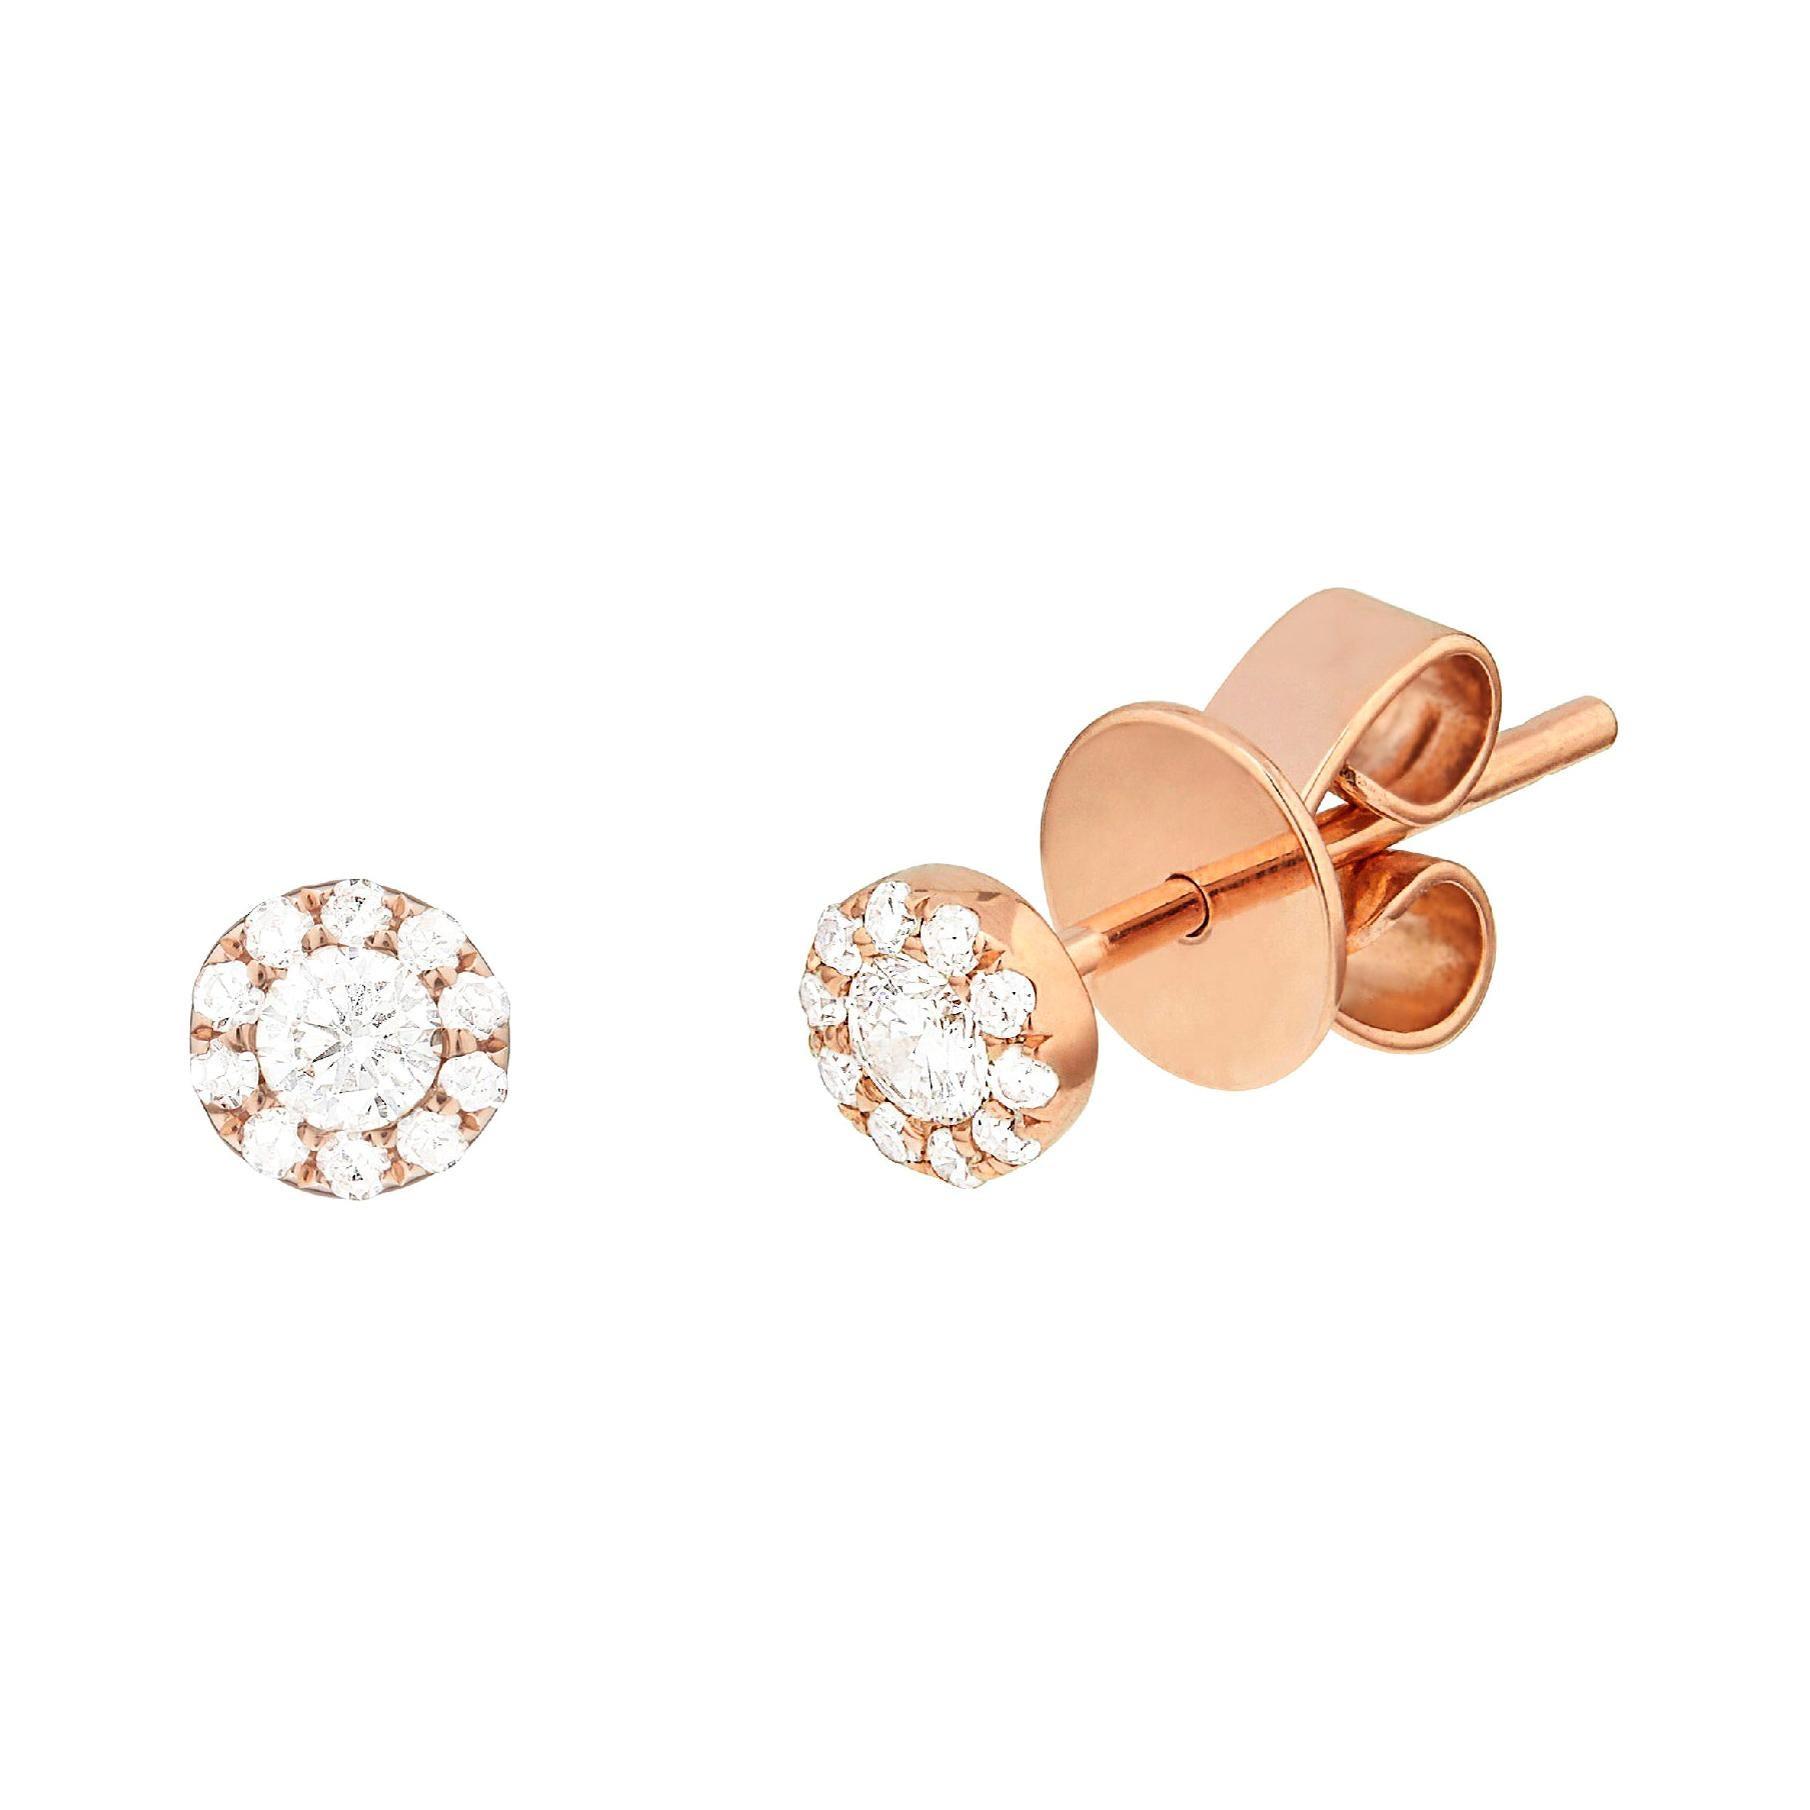 14 Karat Rose Gold 0.115 Carat Diamond Cluster Earrings